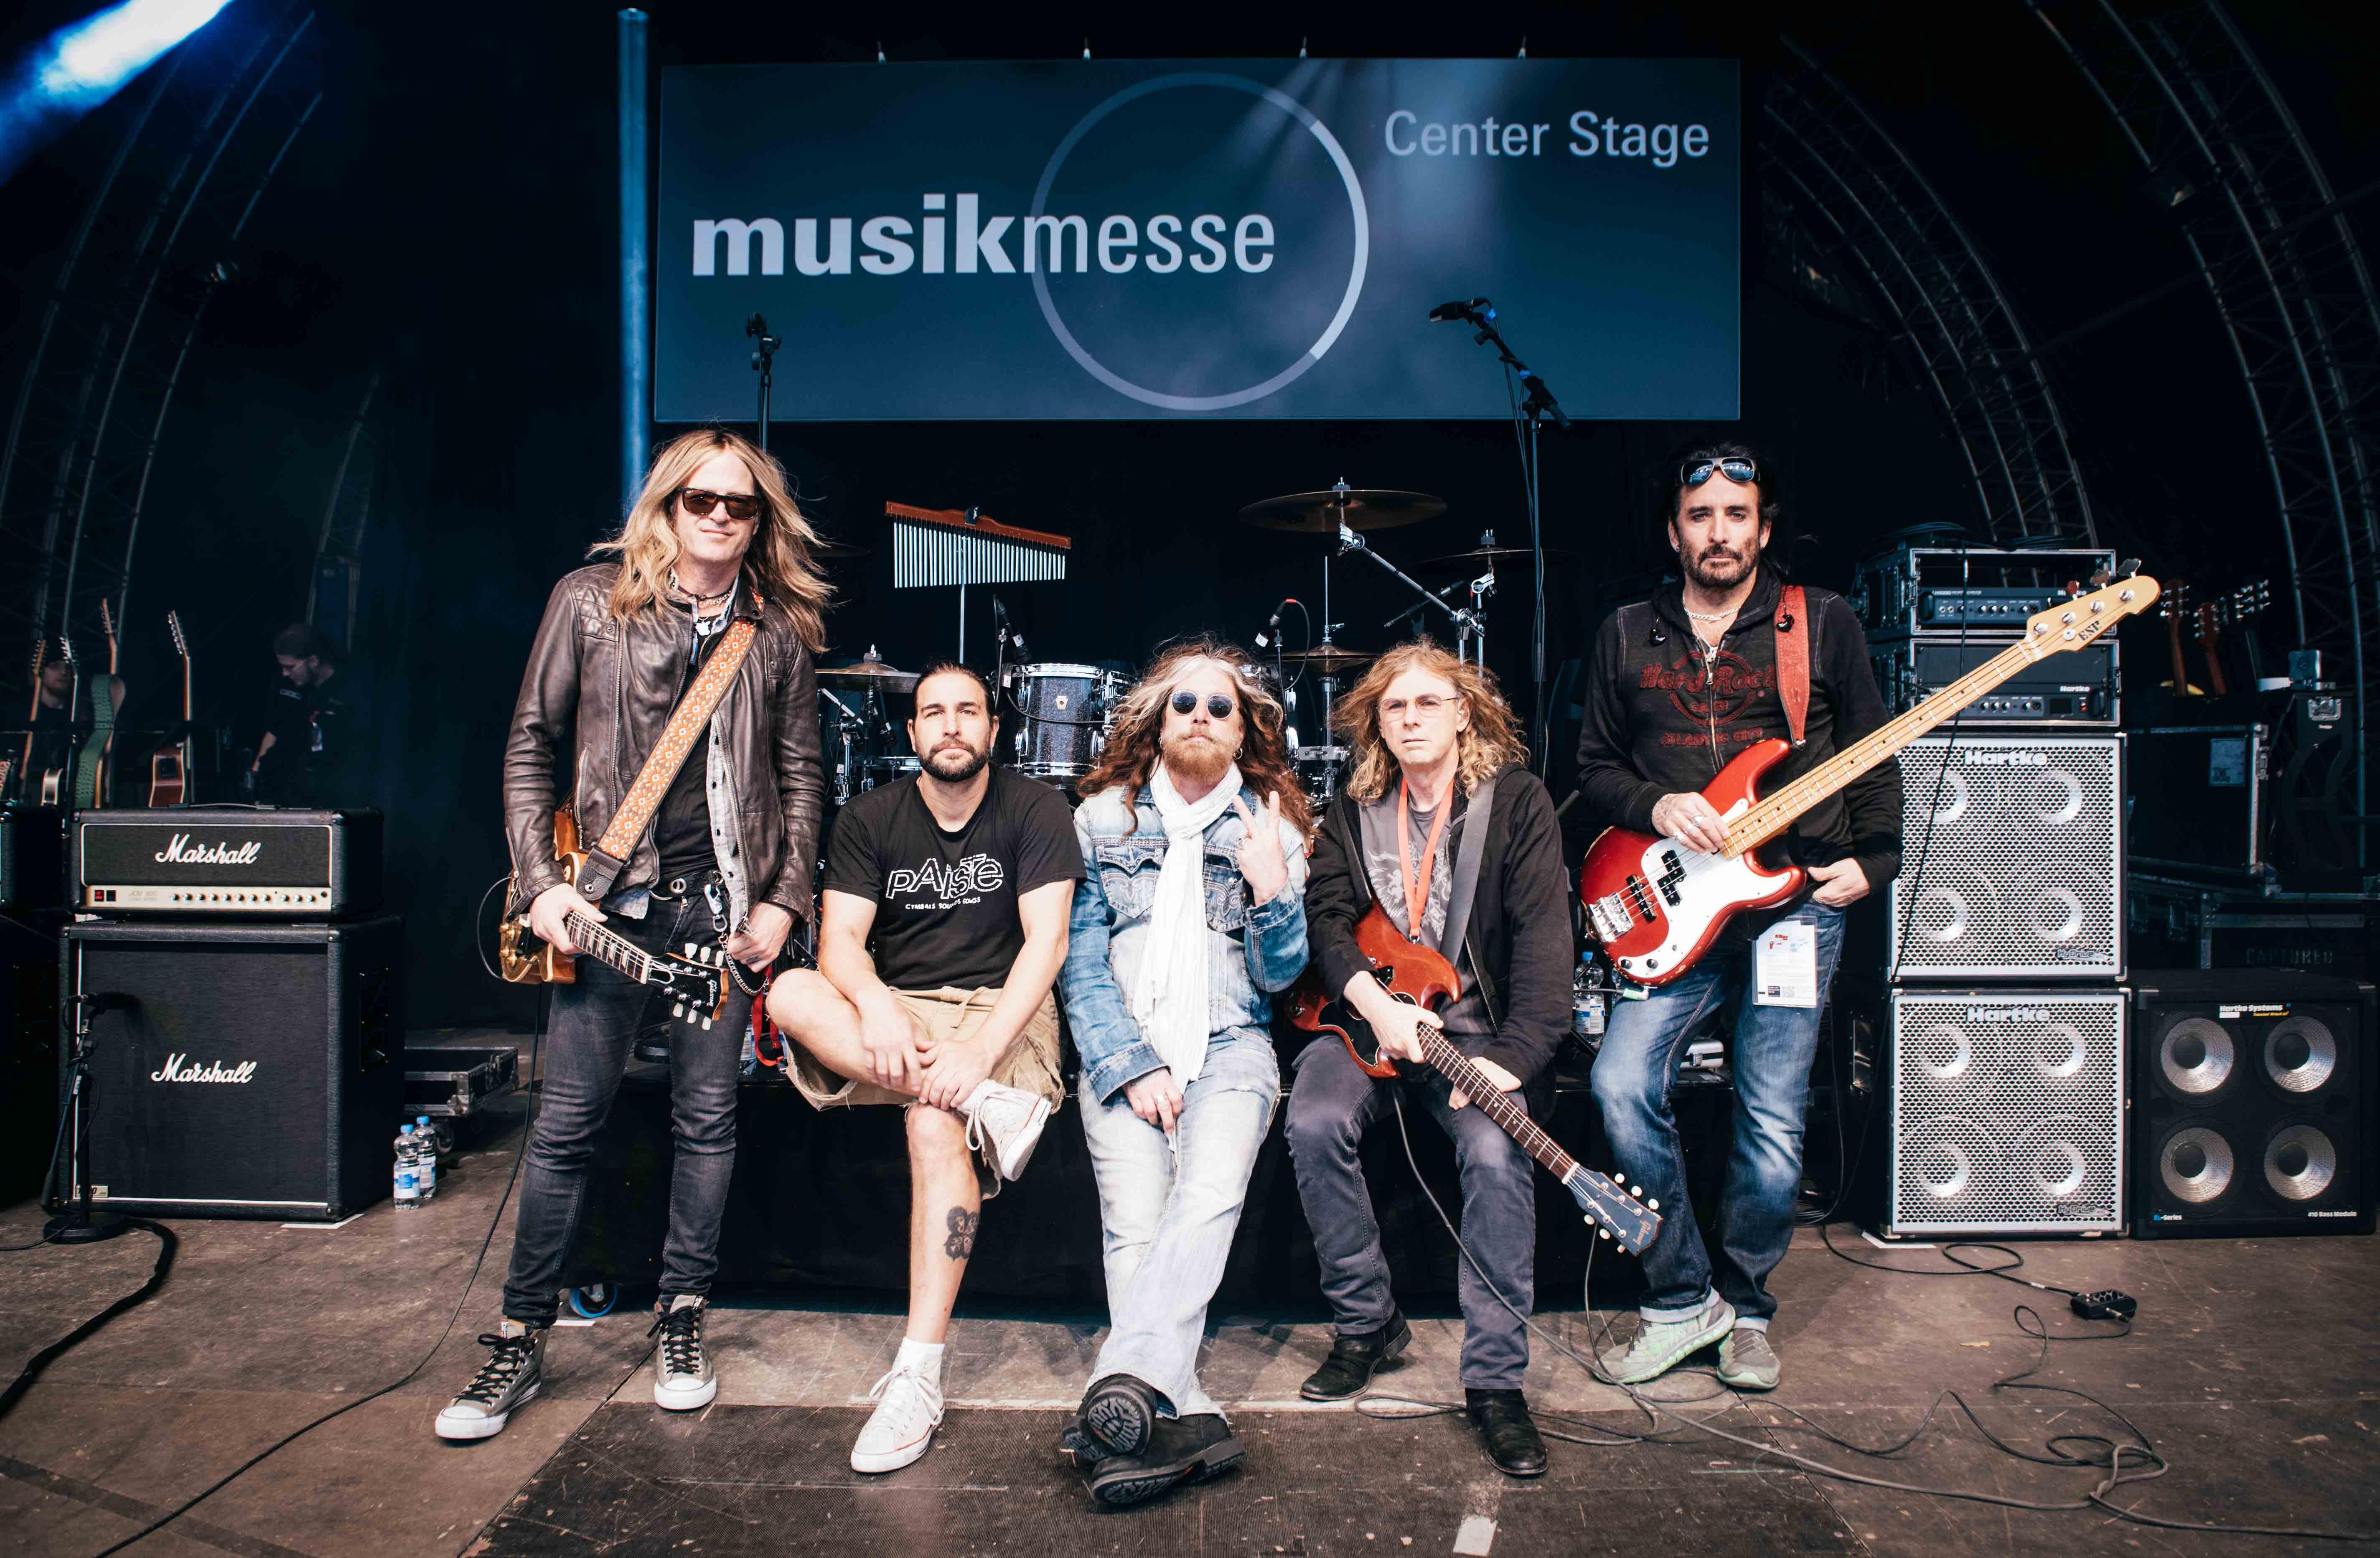 07 Groupshot Musikmesse COL OH-TDD-07-04-16---16